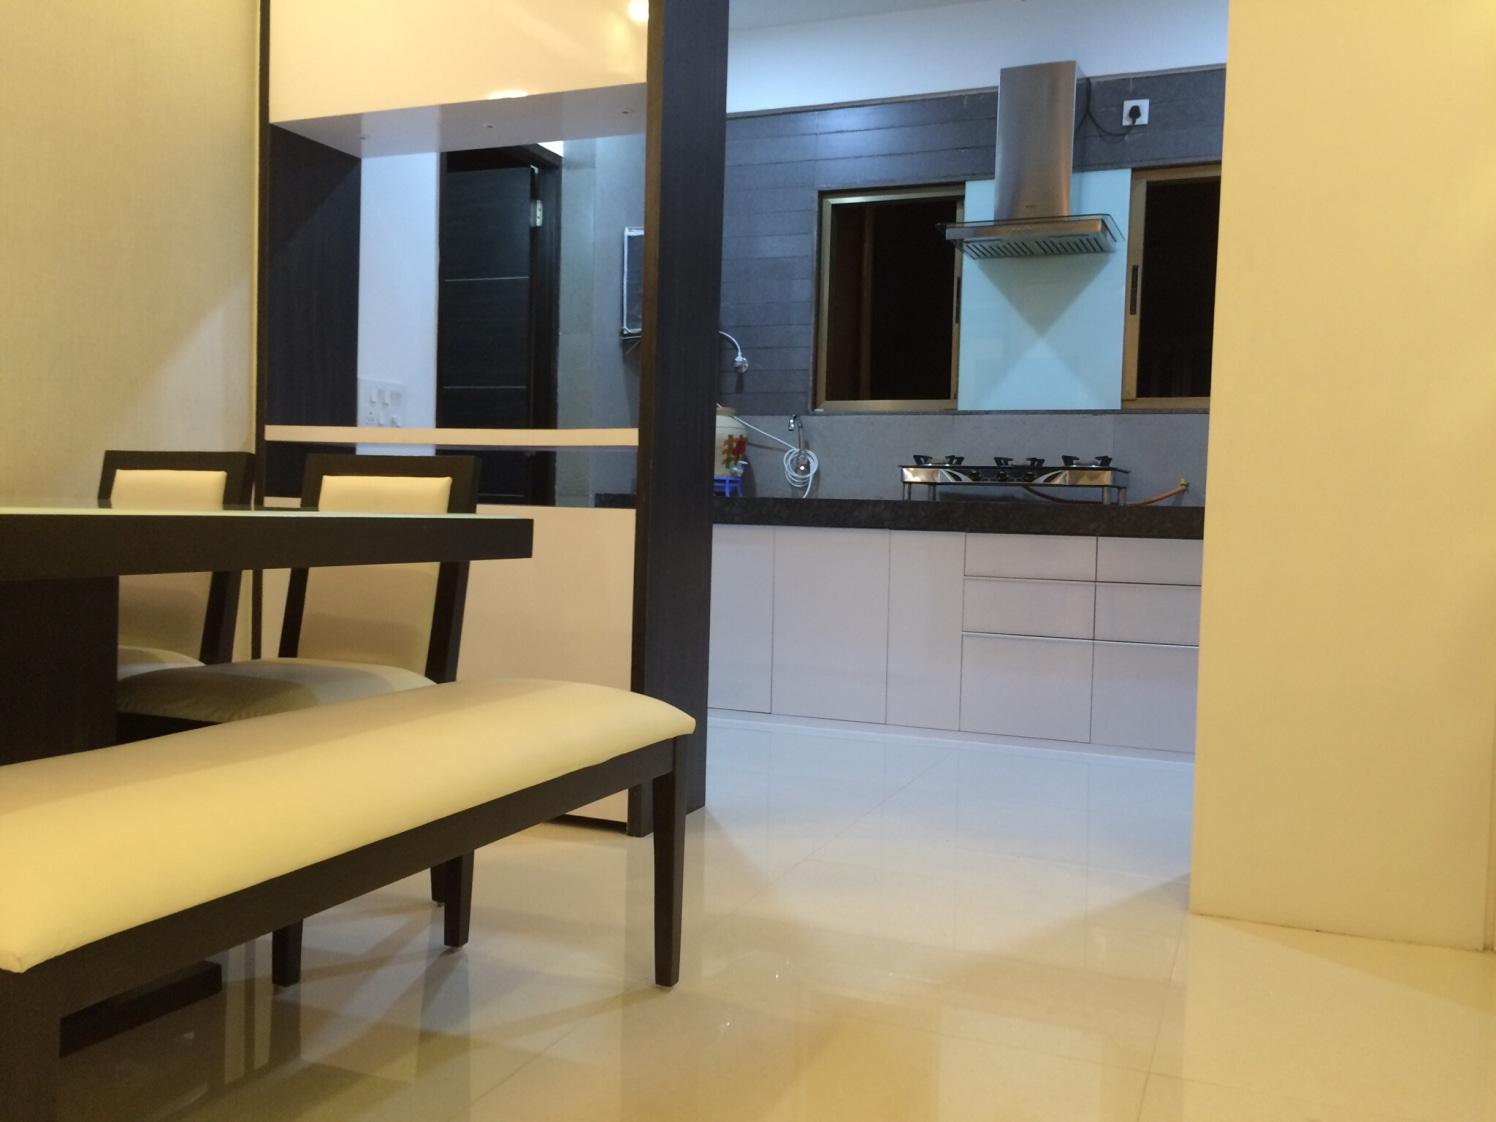 Dinning space with marble flooring  and white  furniture by Vatsal Hadvani Modular-kitchen Modern | Interior Design Photos & Ideas